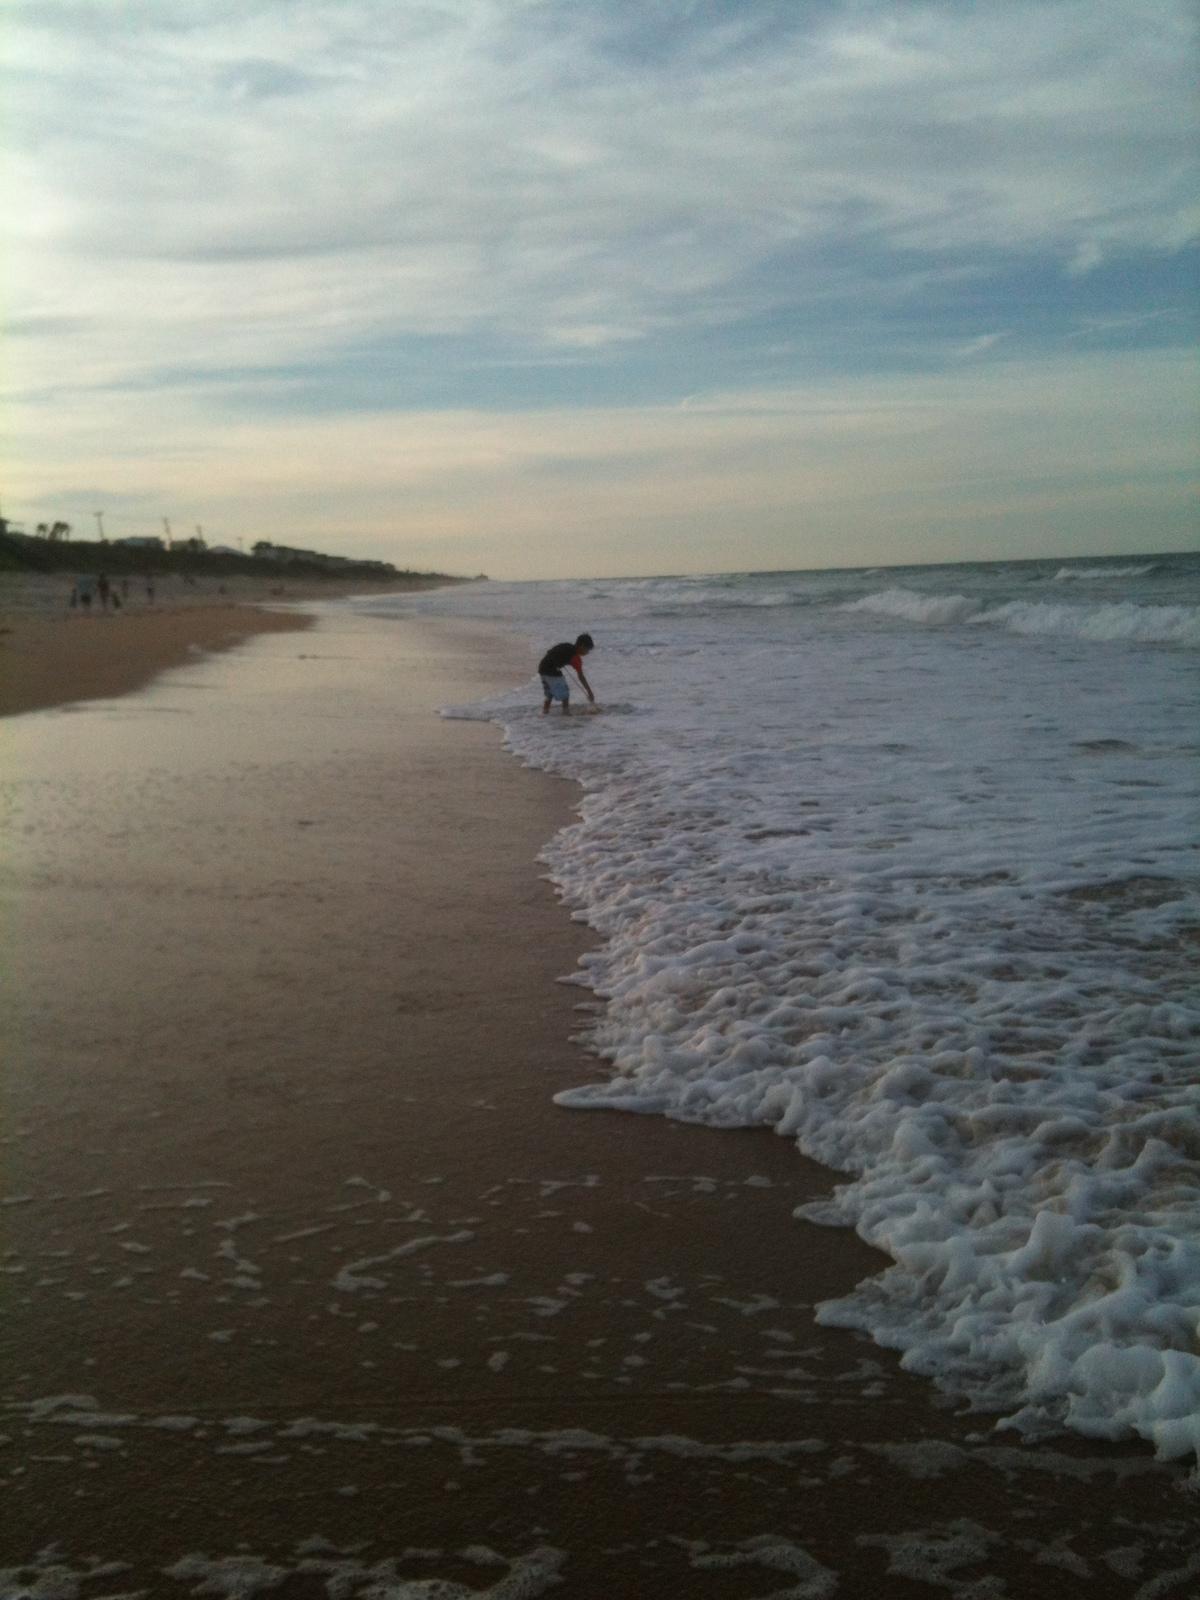 Angela from Ormond Beach